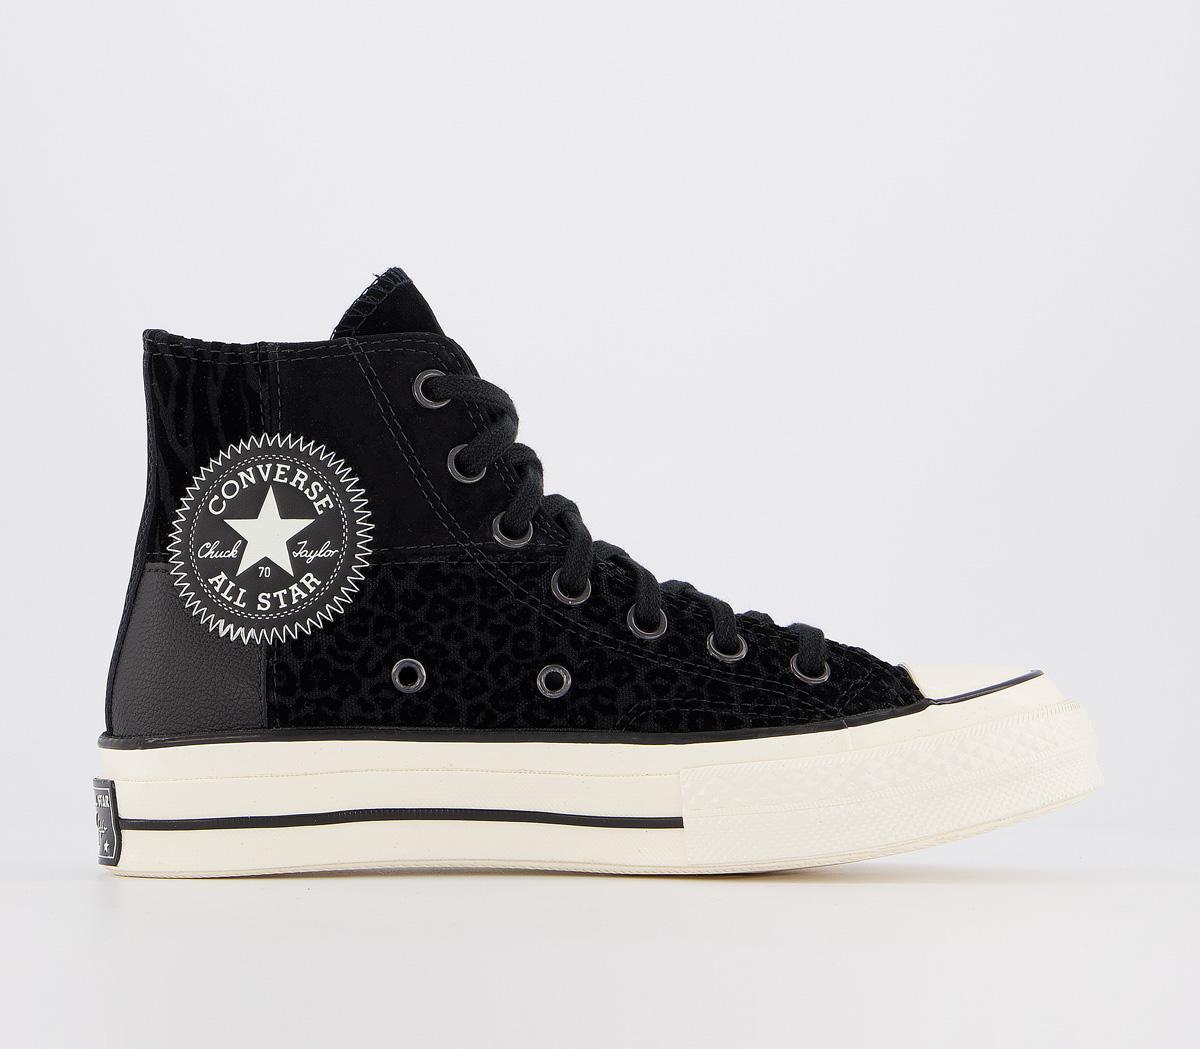 Converse All Star Hi 70 S BLACK ALMOST